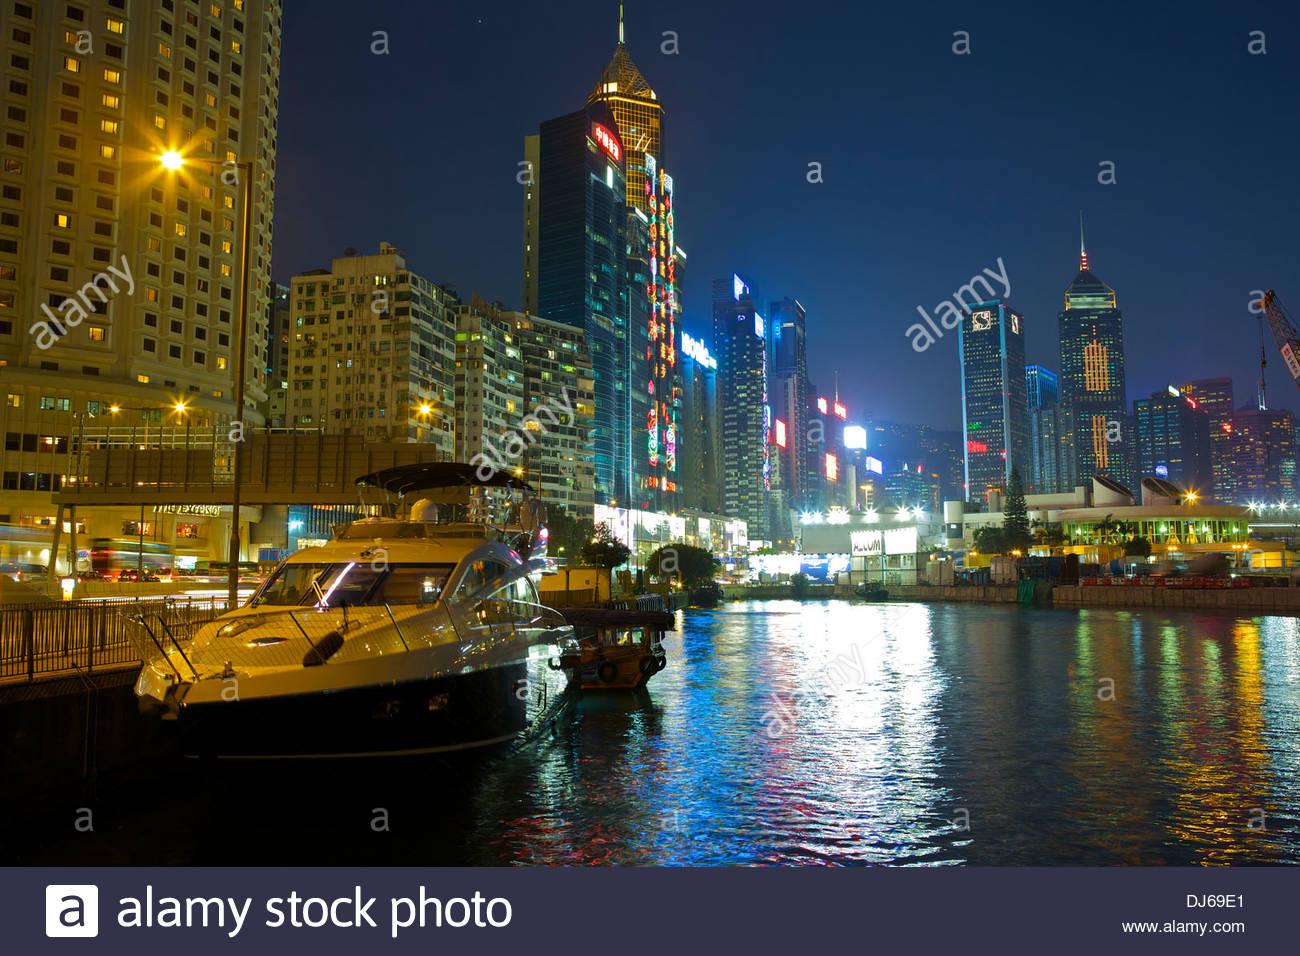 Excelsior Hong Kong Island